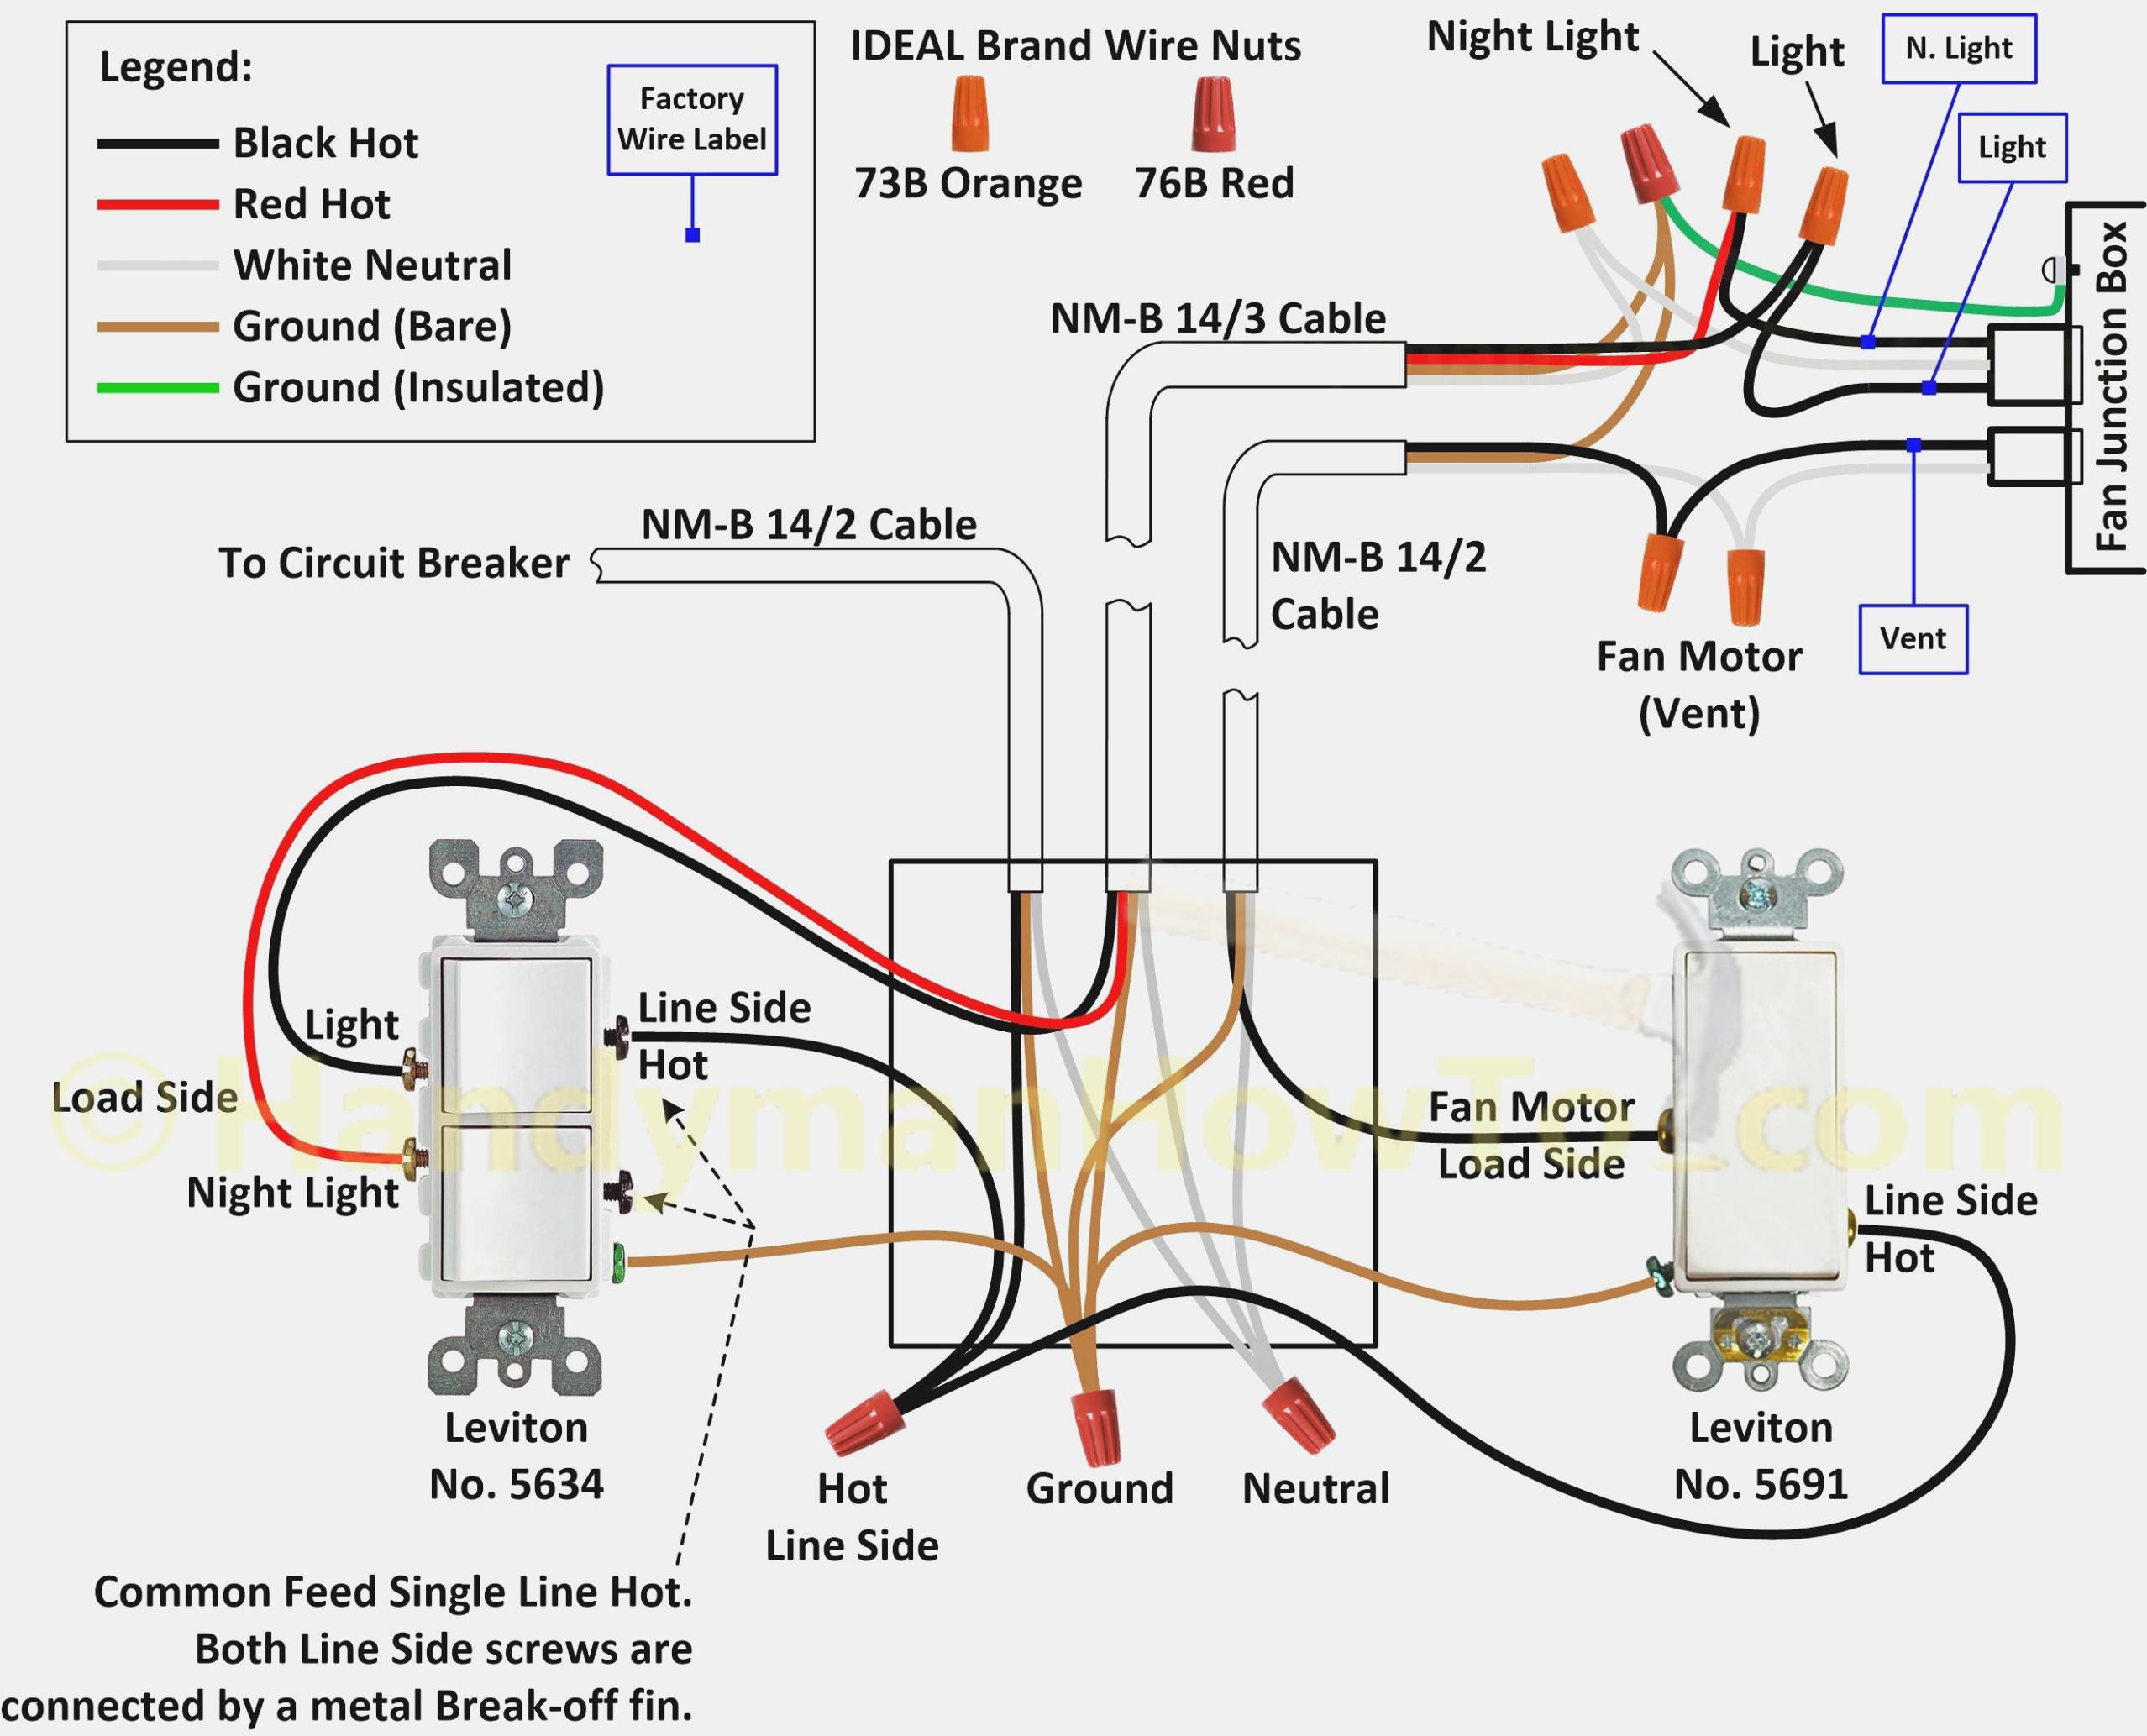 Irrigation Pump Wiring Diagram 240V | Wiring Diagram - Pump Start Relay Wiring Diagram